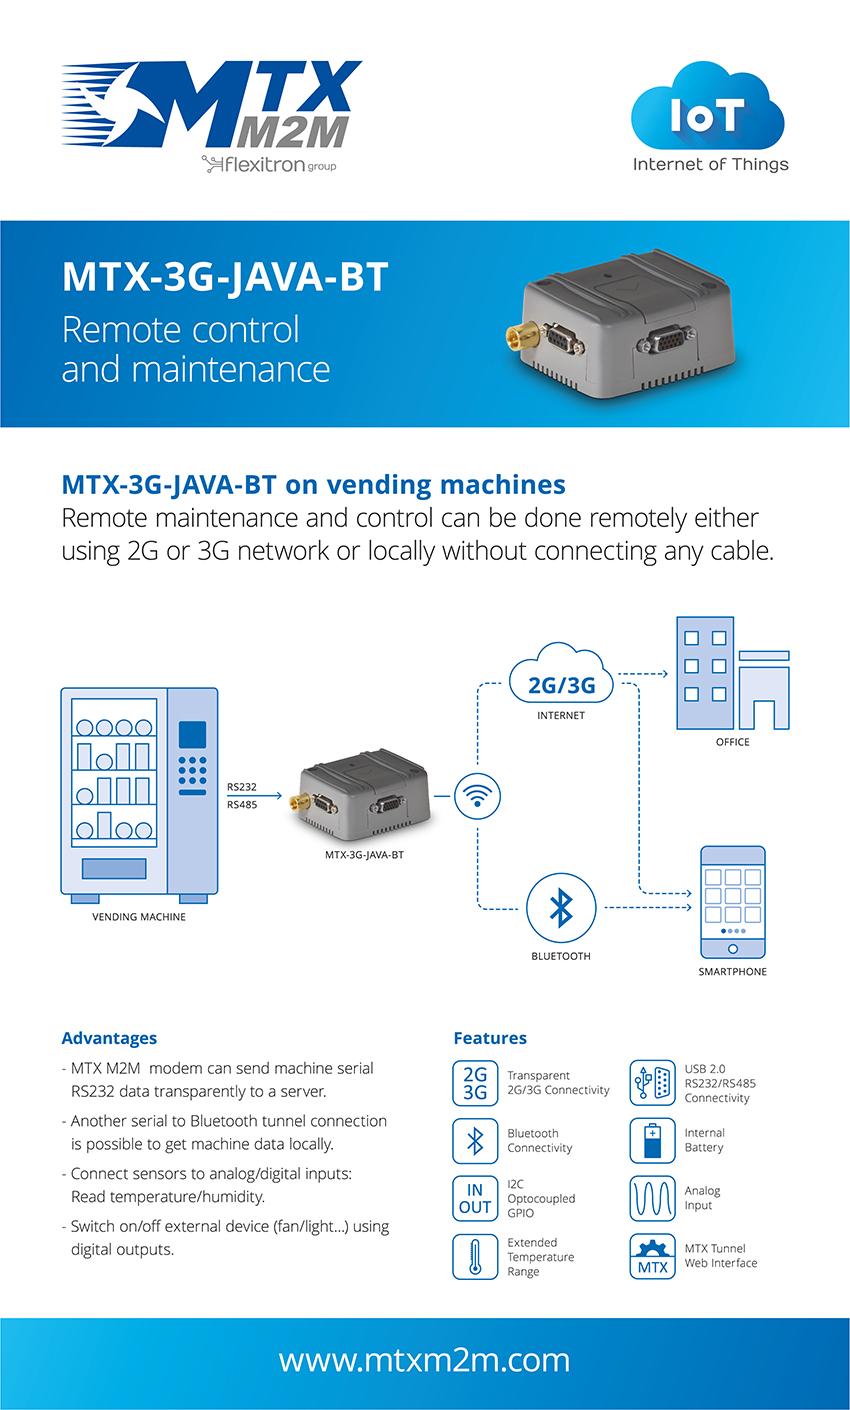 MTX-3G-JAVA-BT máquinas vending